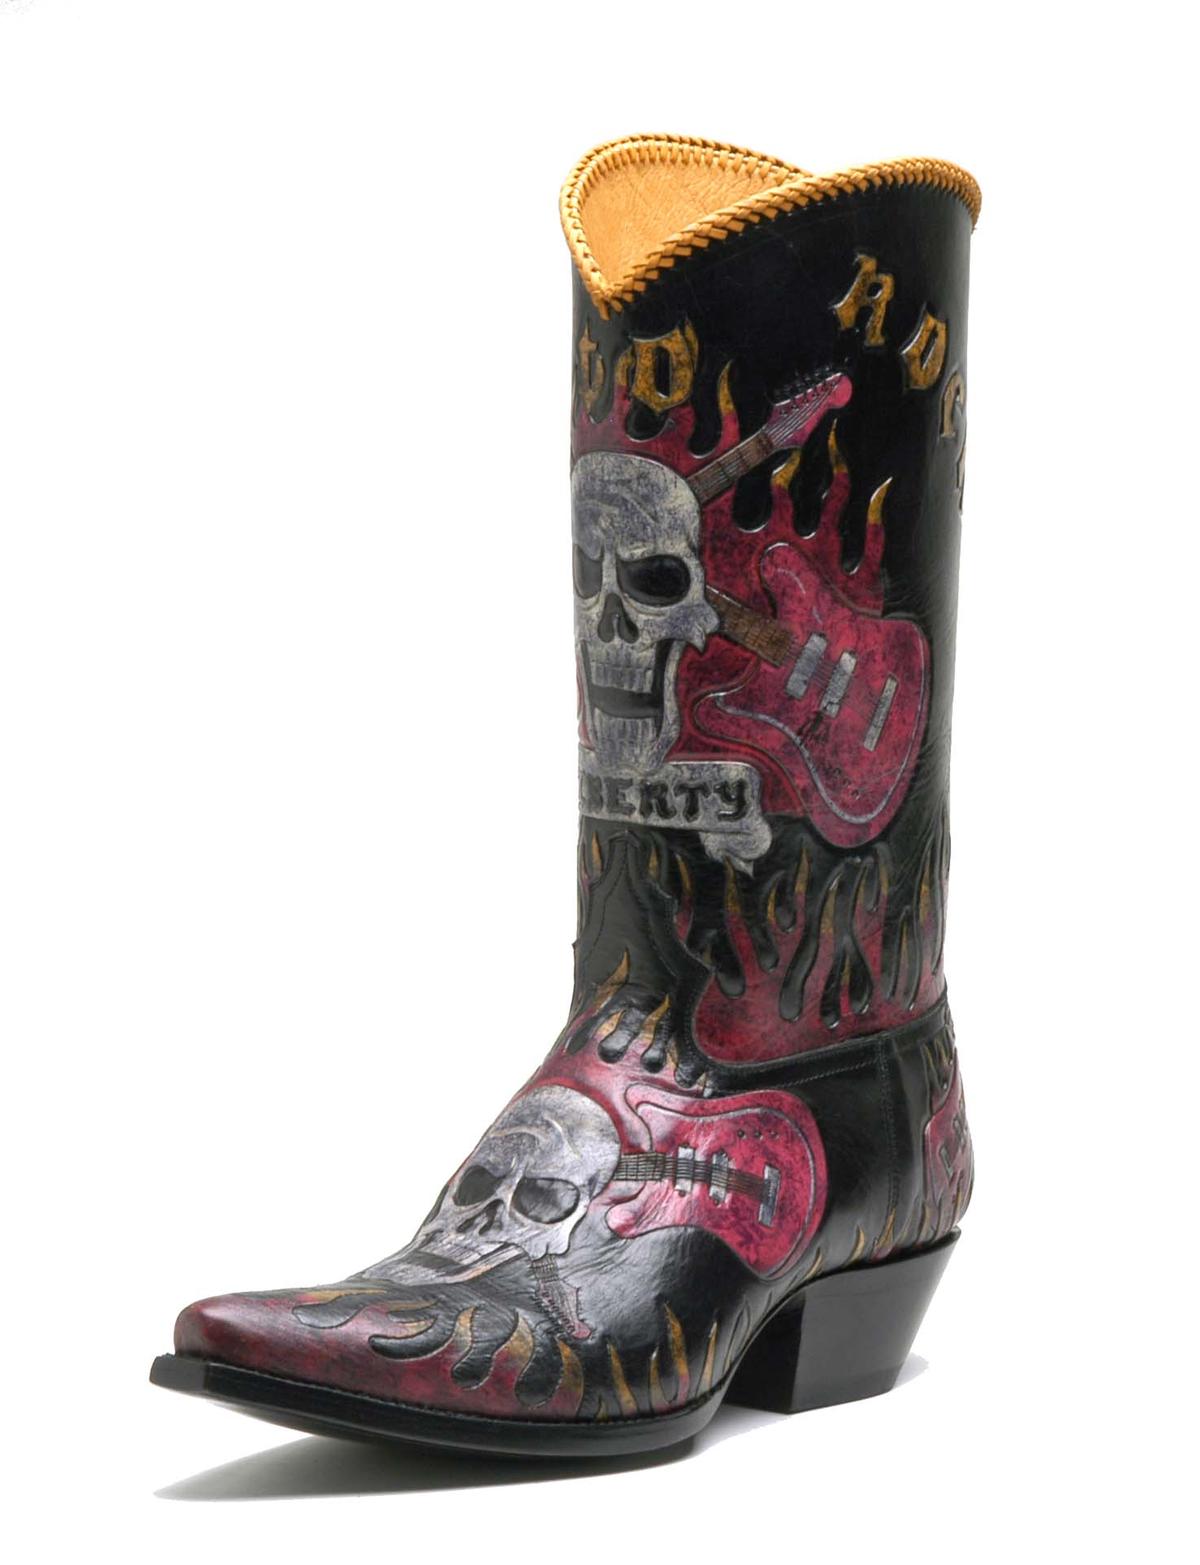 Boots, Custom cowboy boots, Liberty boots